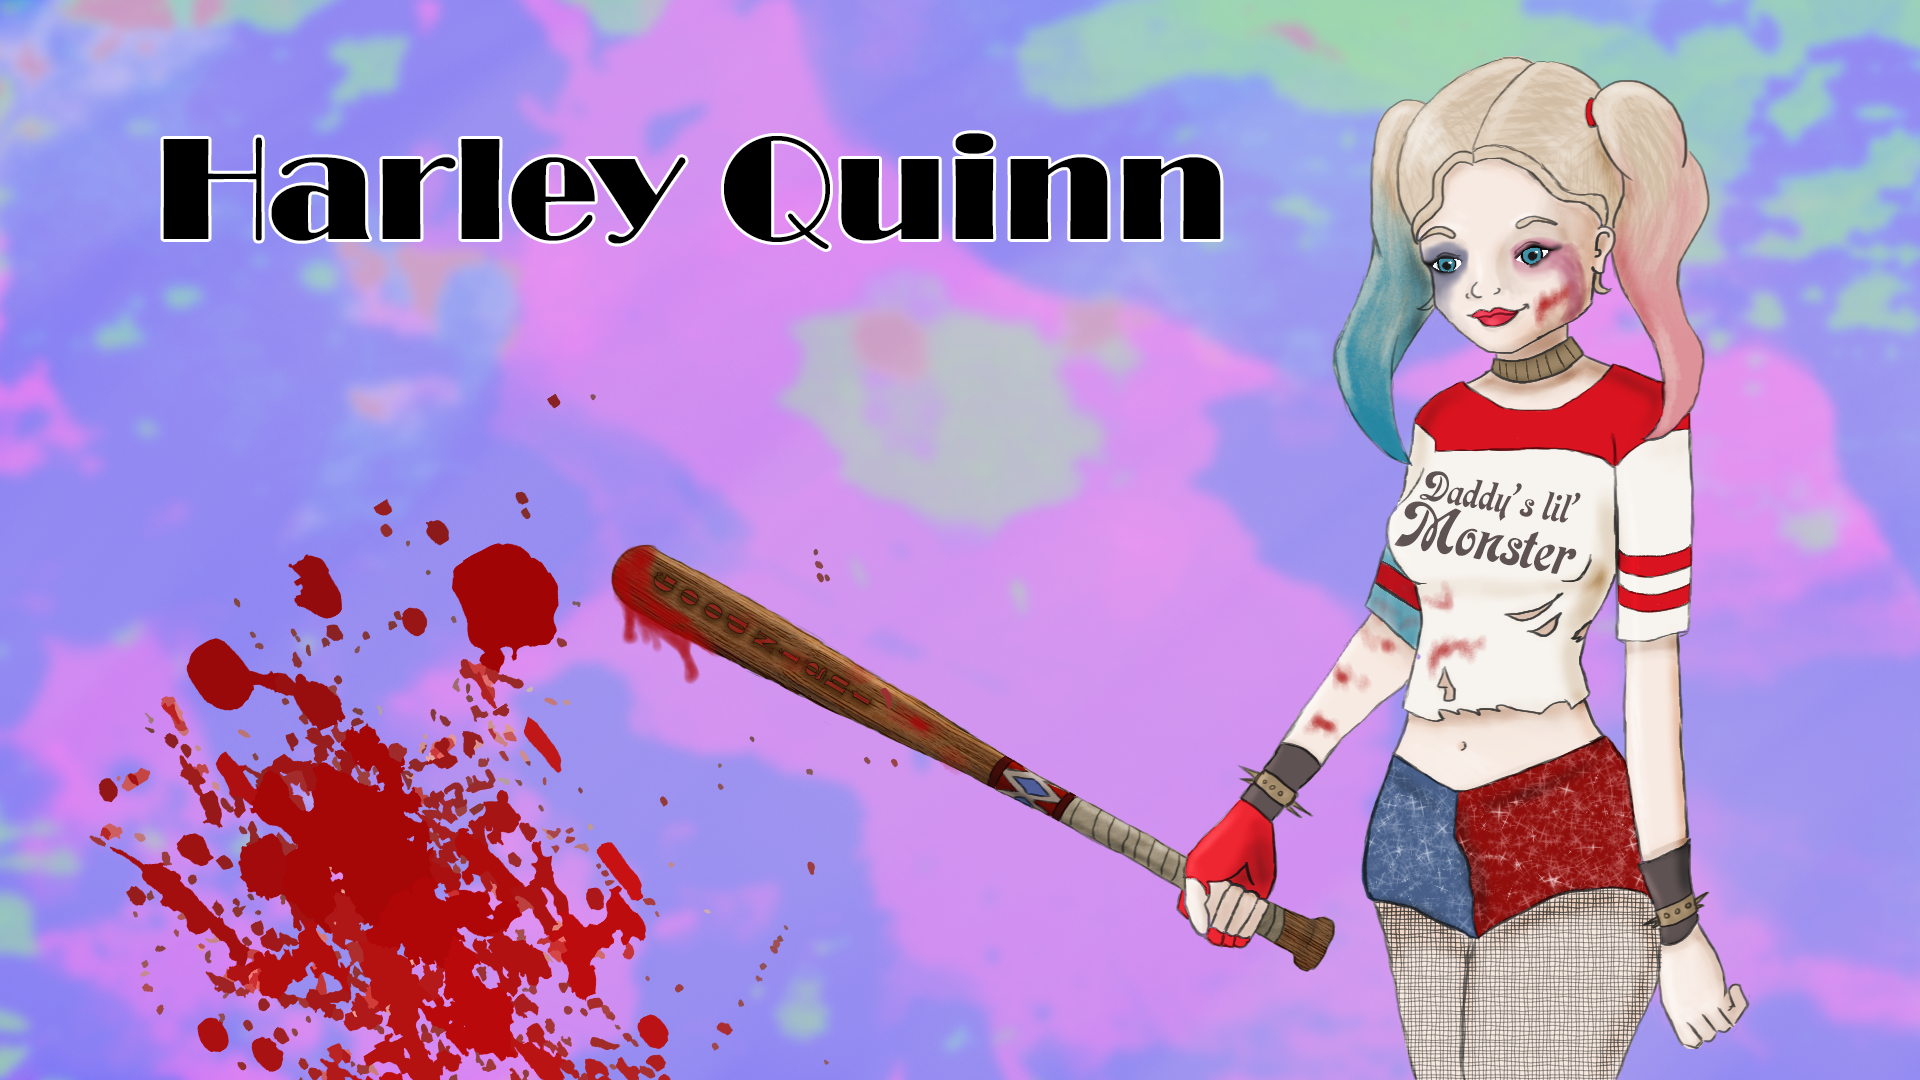 Harley Quinn saying Goodnight